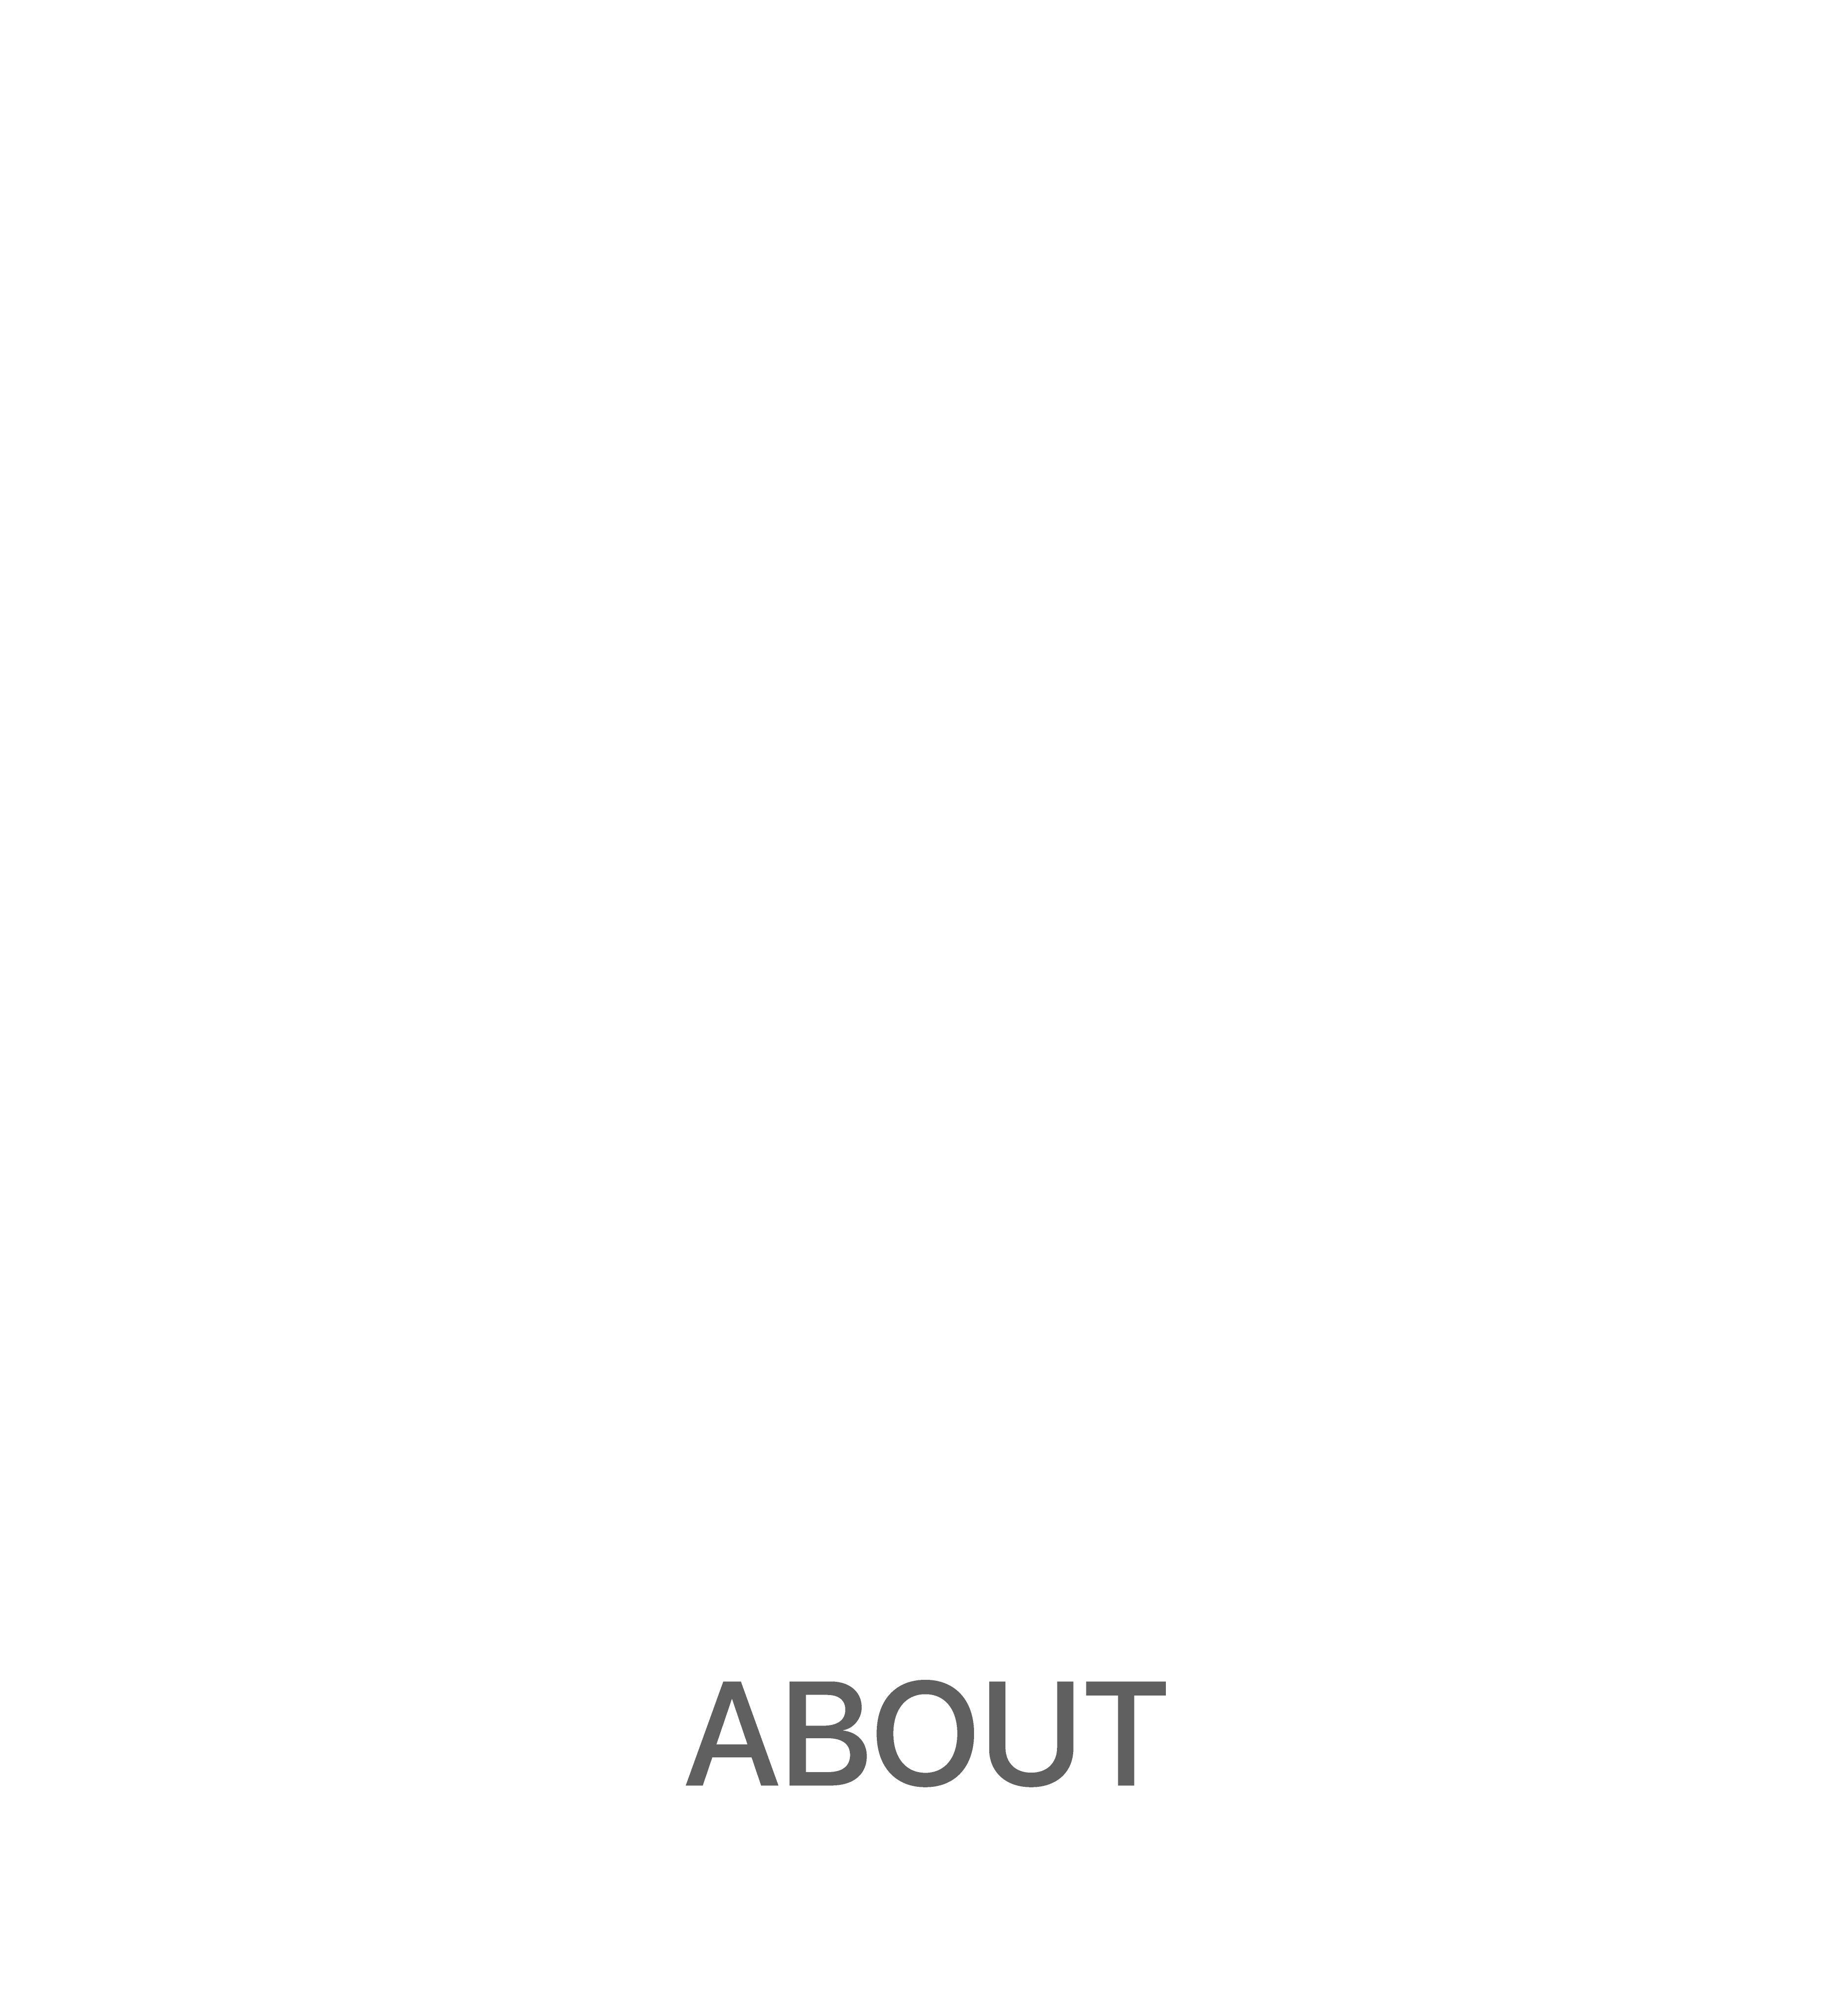 About Platform